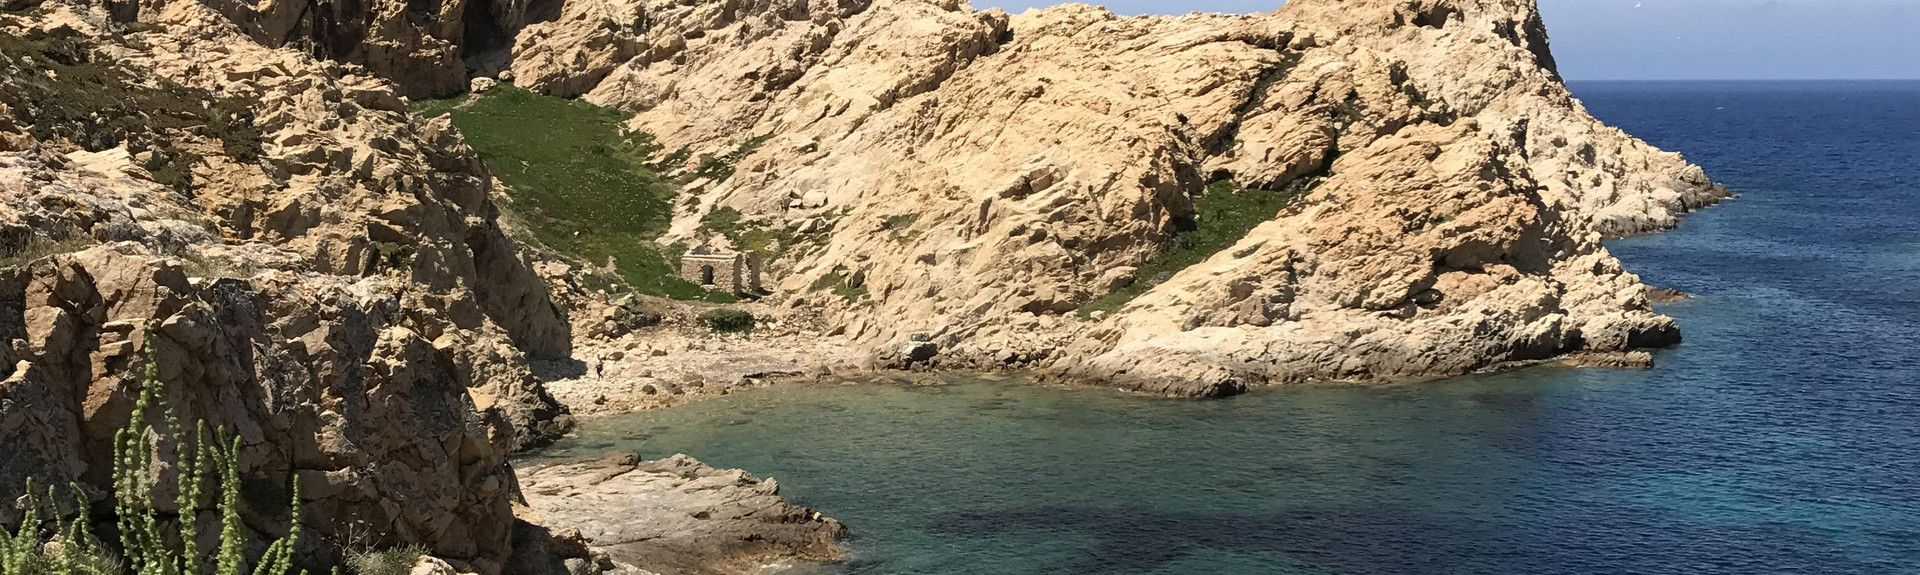 Urtaca, Haute-Corse, França